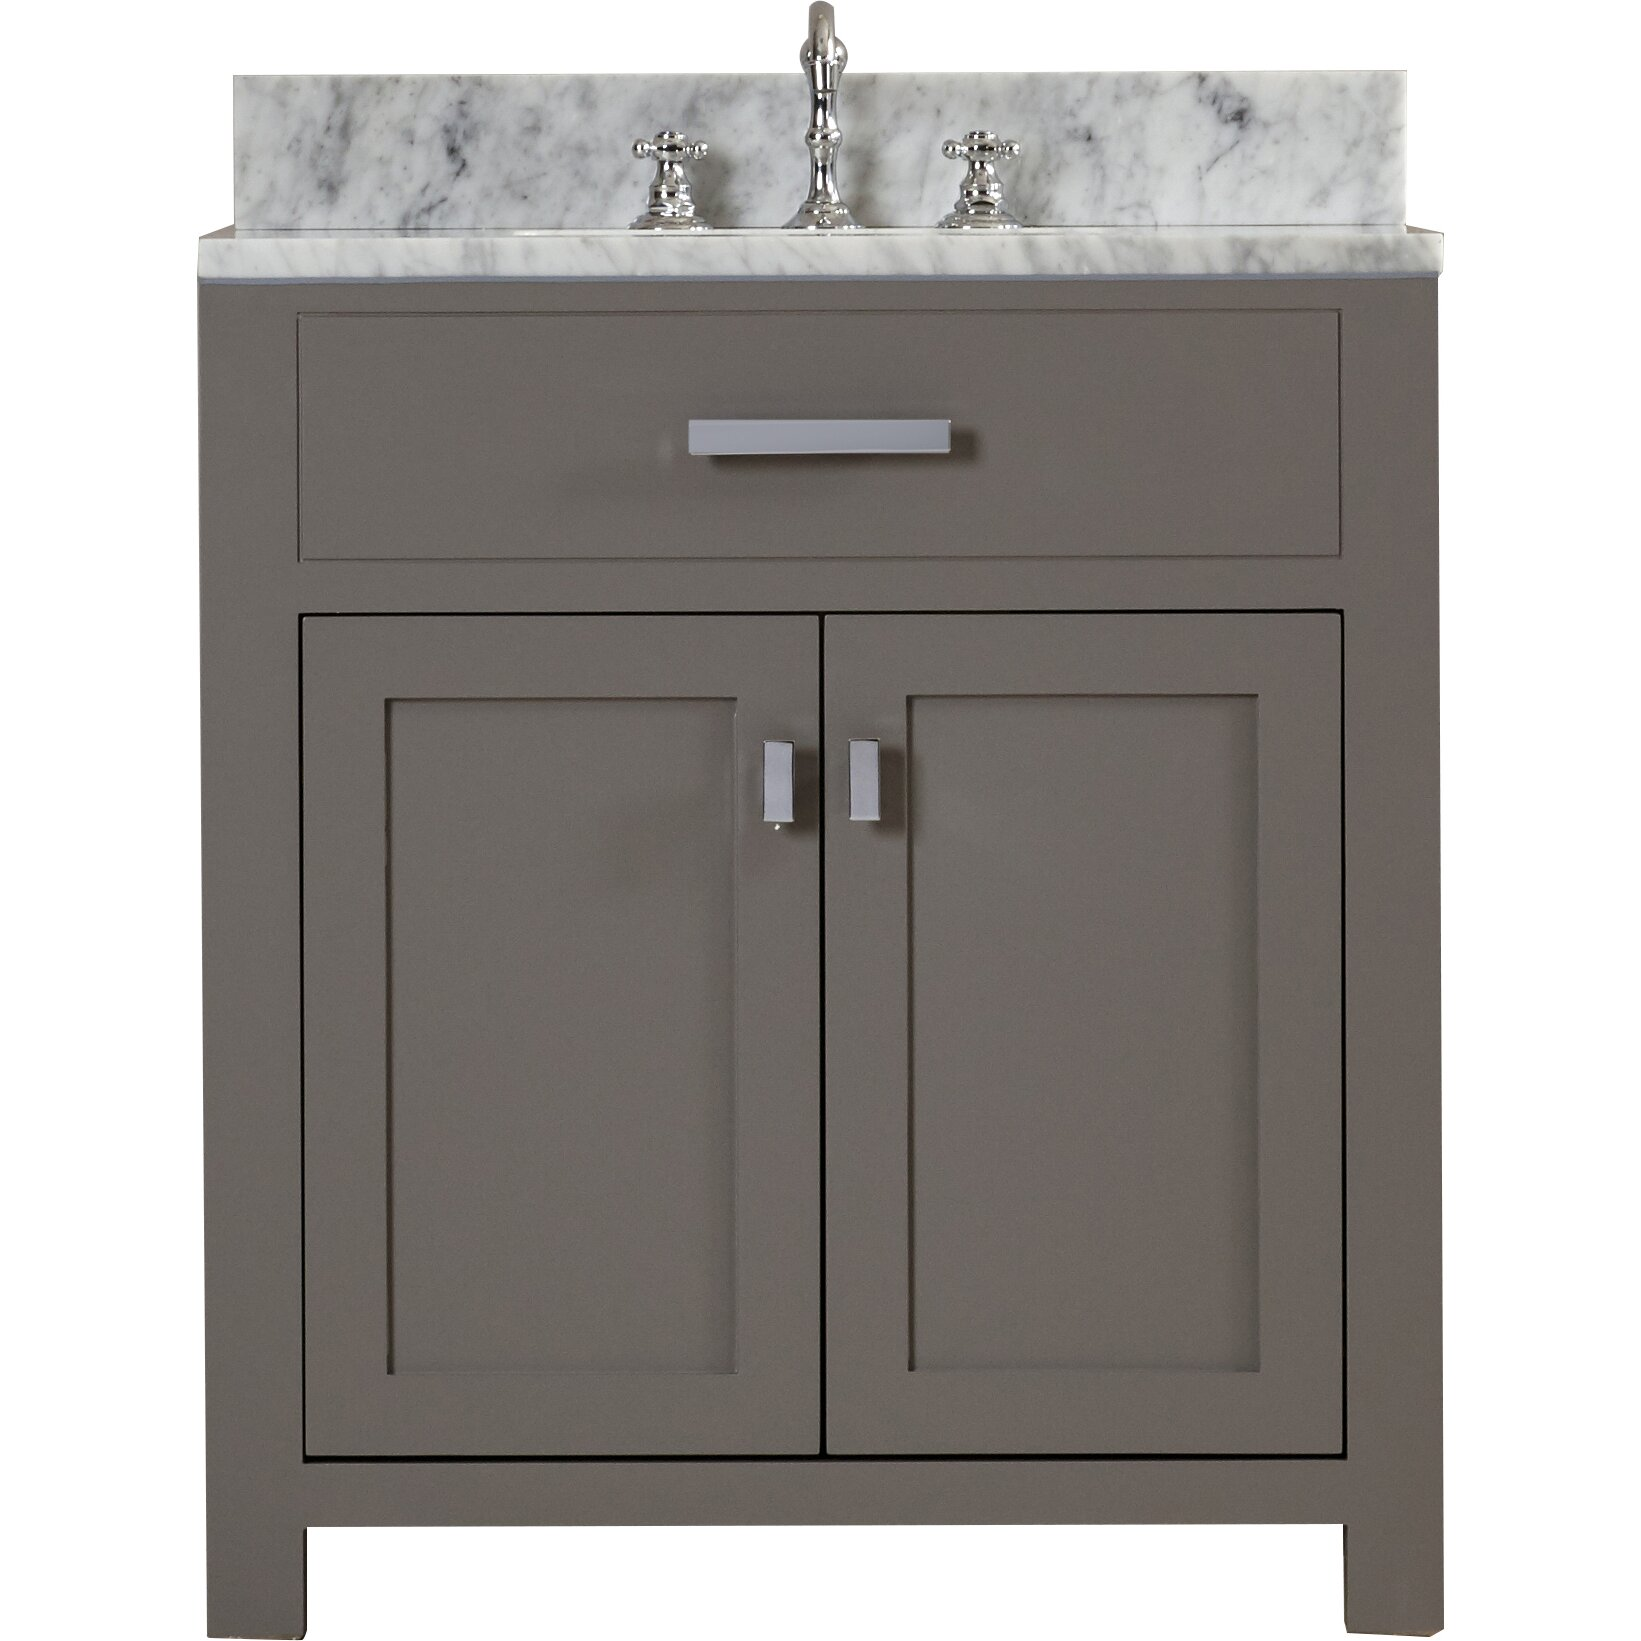 Dcor design creighton 30 single sink bathroom vanity set - 30 inch single sink bathroom vanity ...